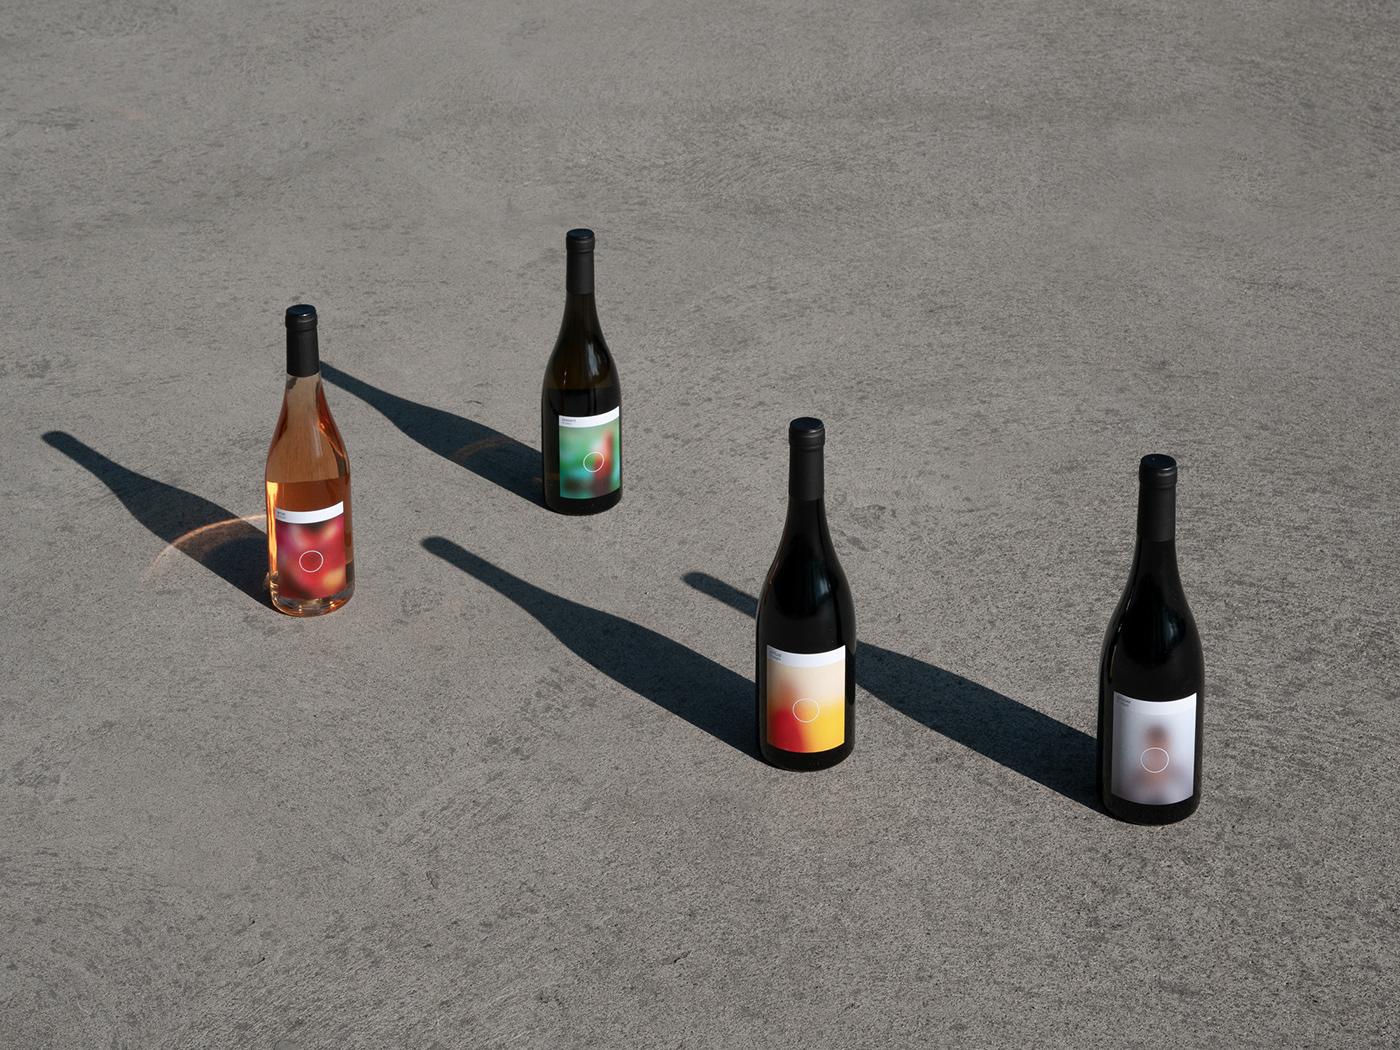 wine winelabel Label instagram blur eco alcohol beverage Collection bottles